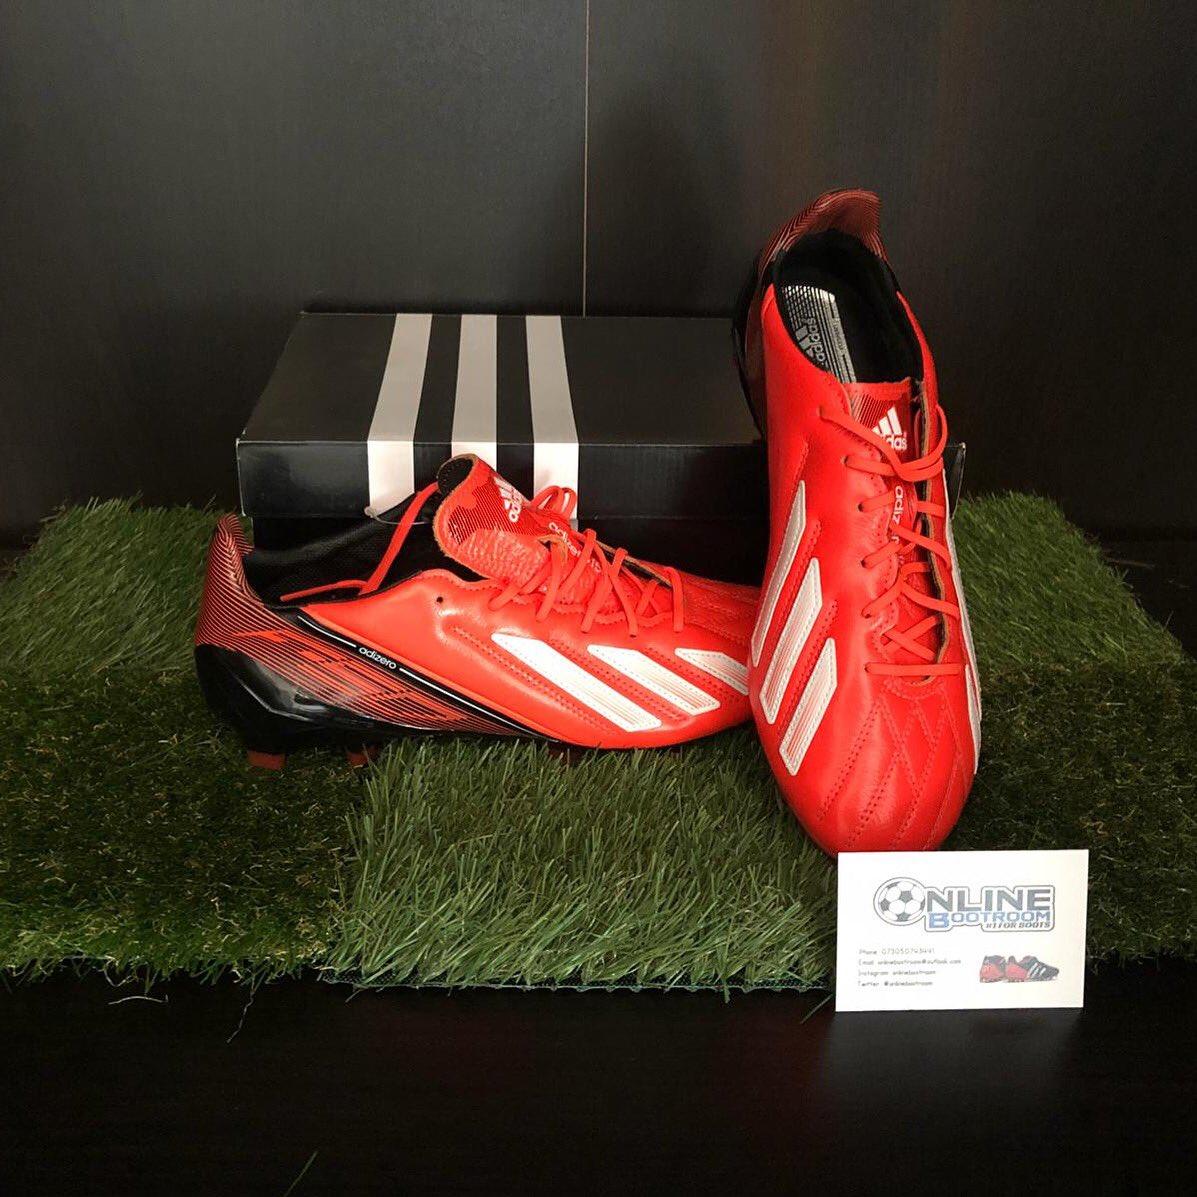 7b8a150ee  adizero ·  f50  adidas  footballboots  rareboots  onlinebootroom   footyboots  footballbootspic.twitter.com 1FrPBI3e2T